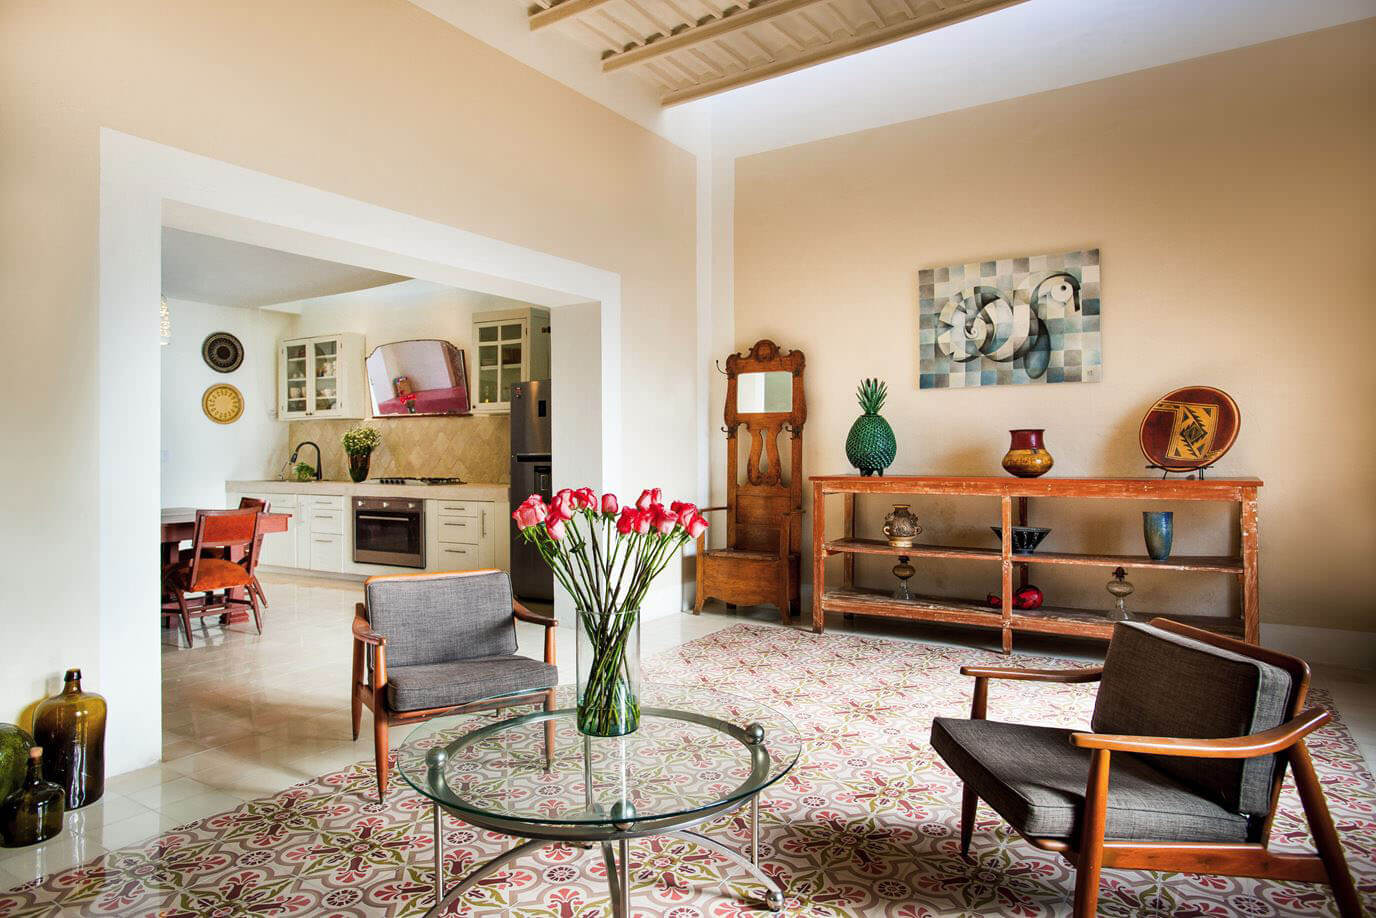 Best Elements of Mexican Interior Design Ideas - Live Enhanced